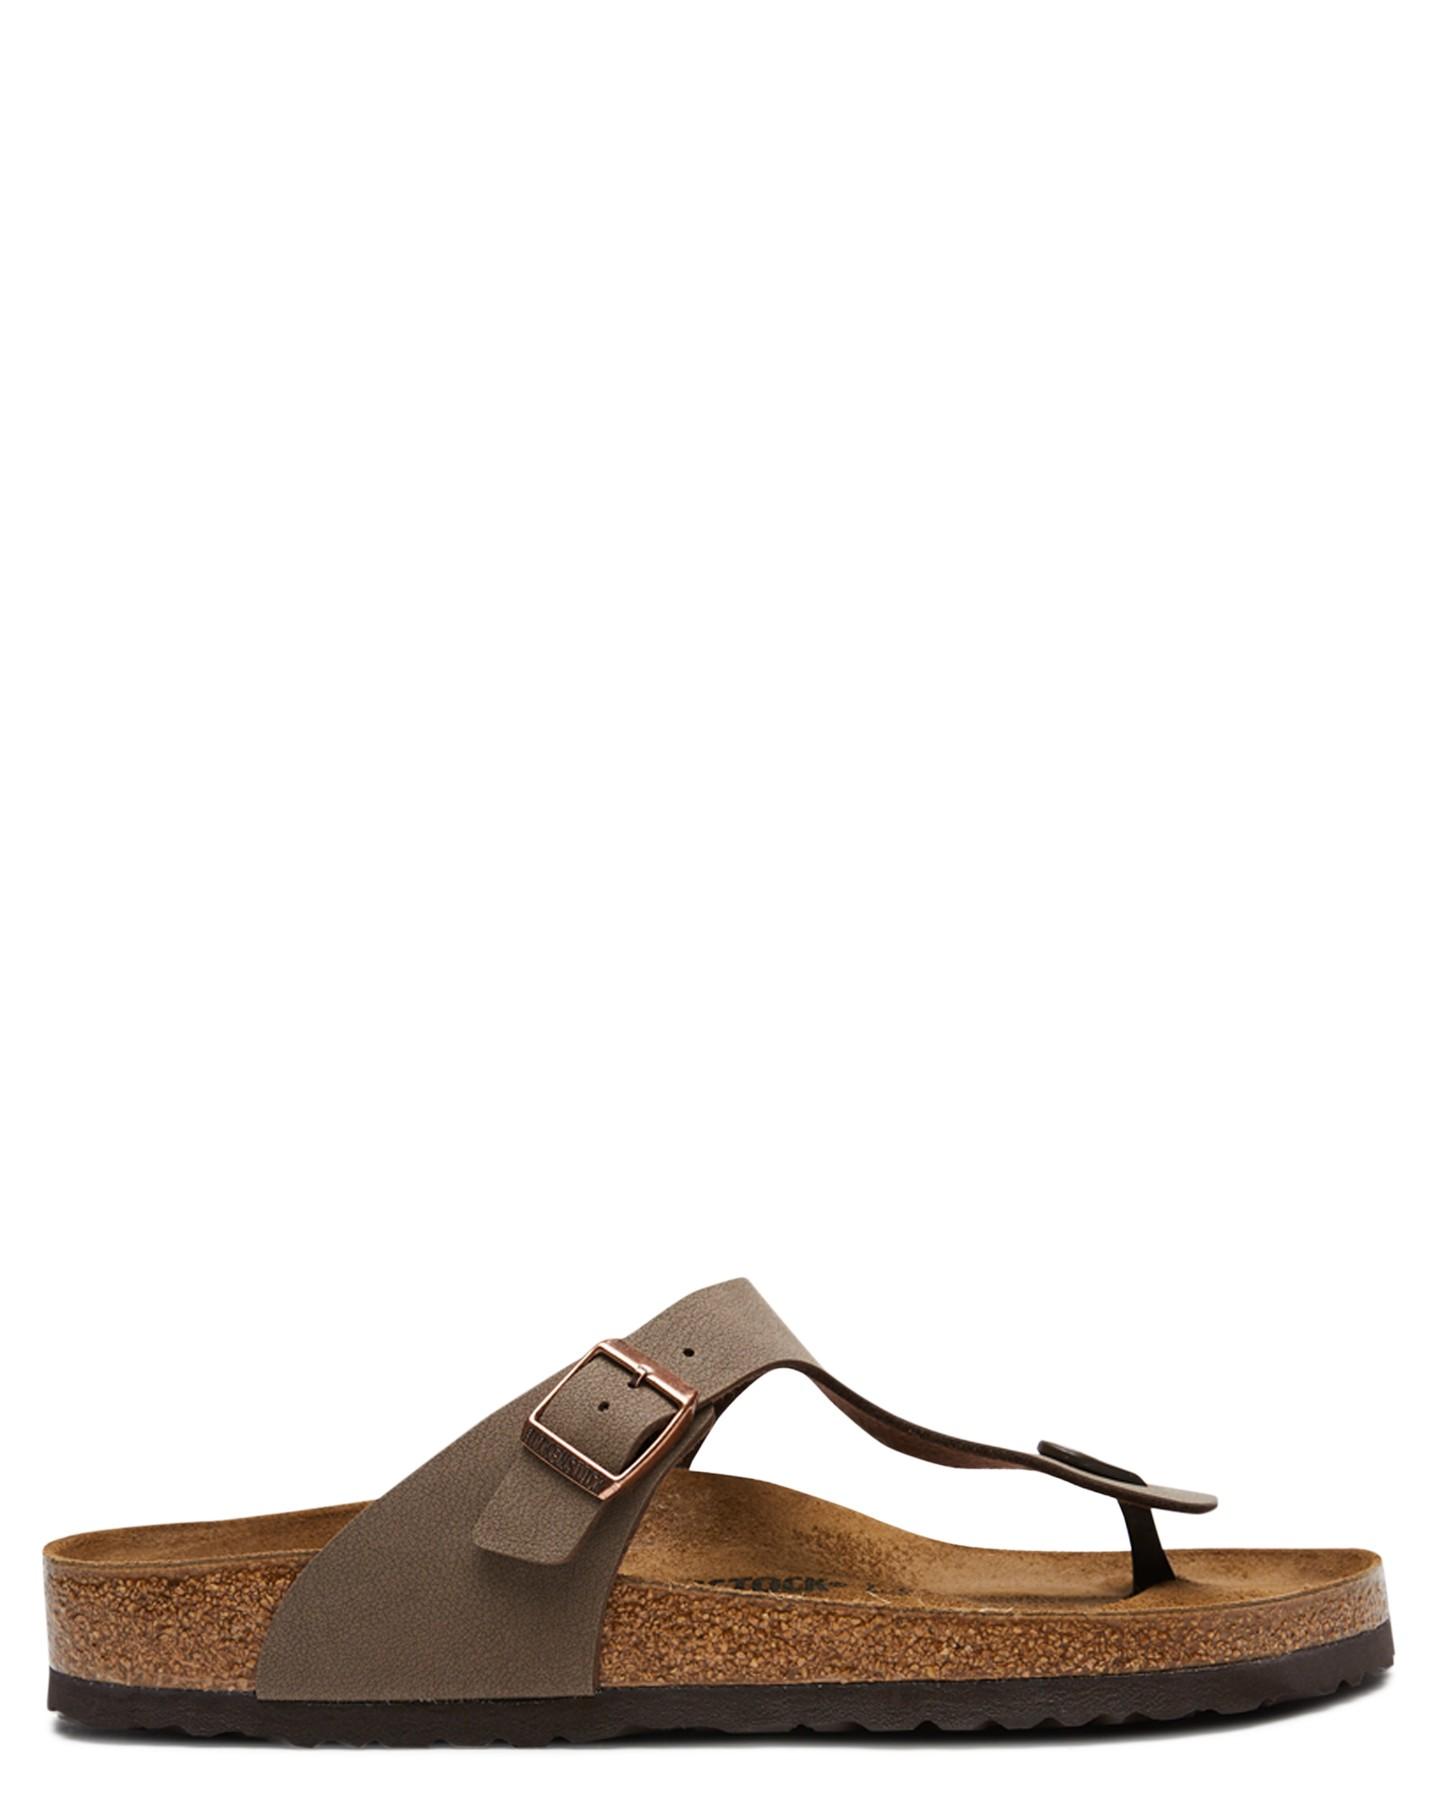 Birkenstock Mens Regular Gizeh Sandal